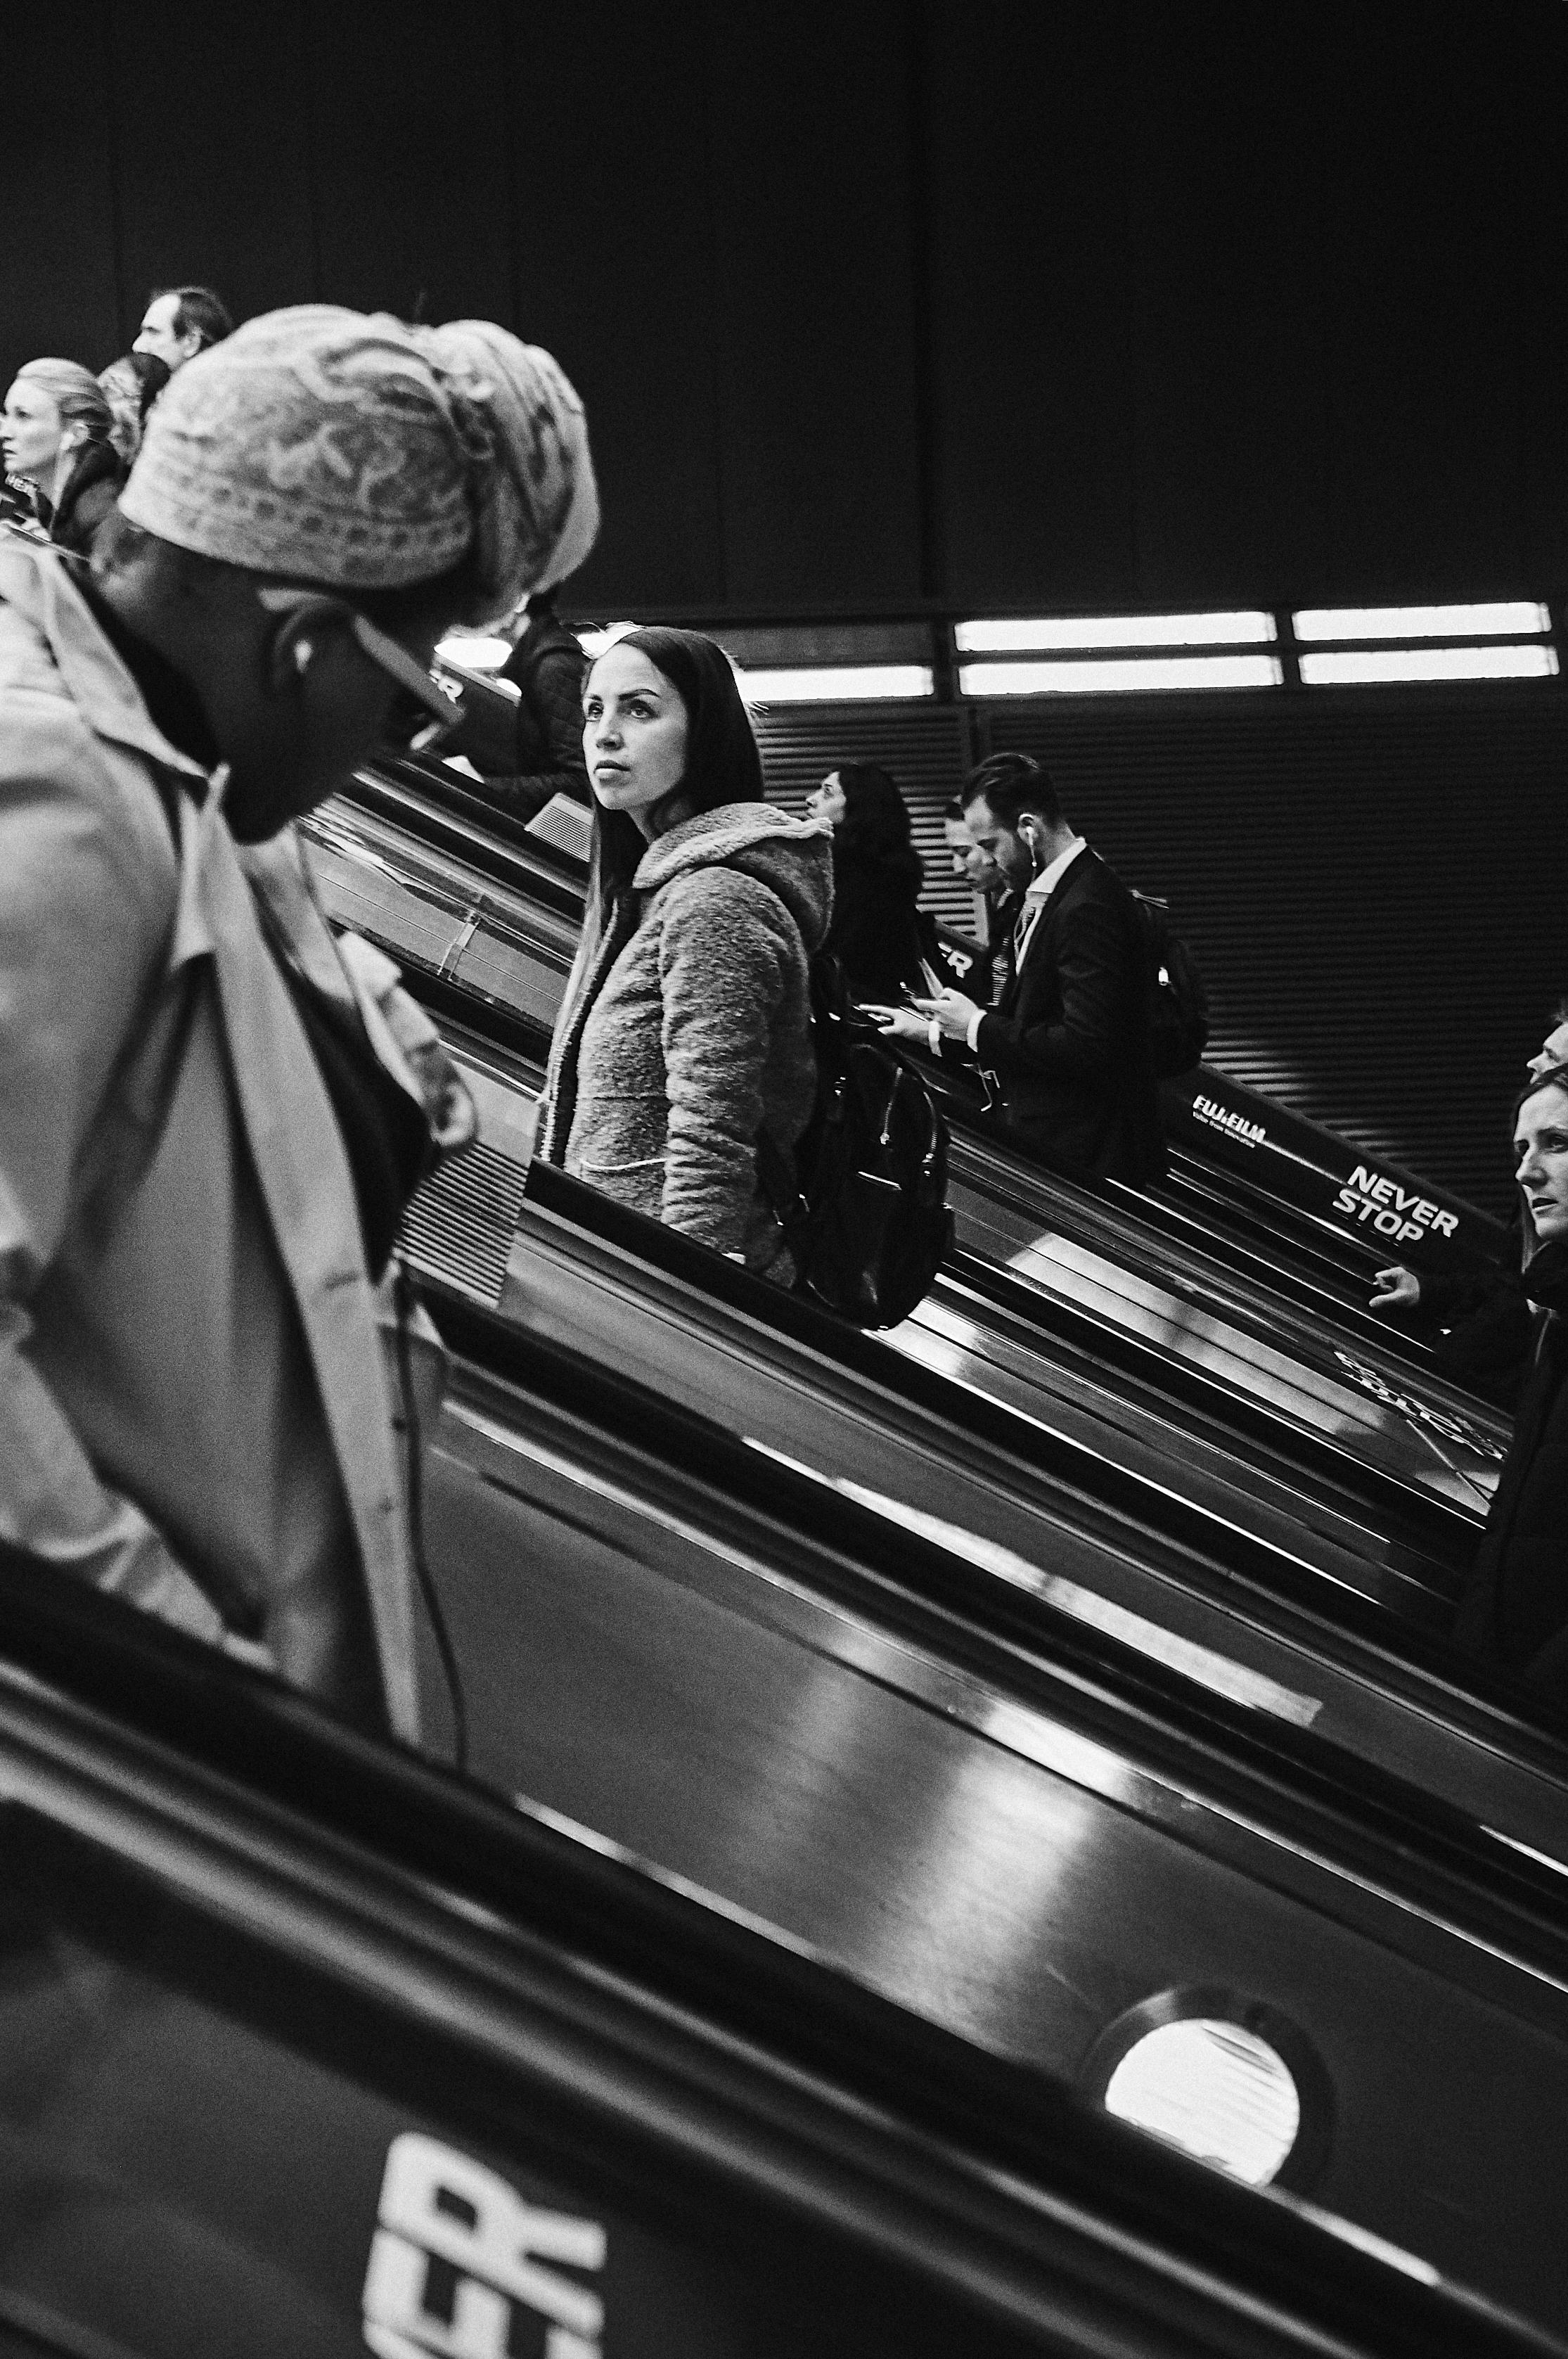 London_City_Commuters_25_03_19_0912.jpg